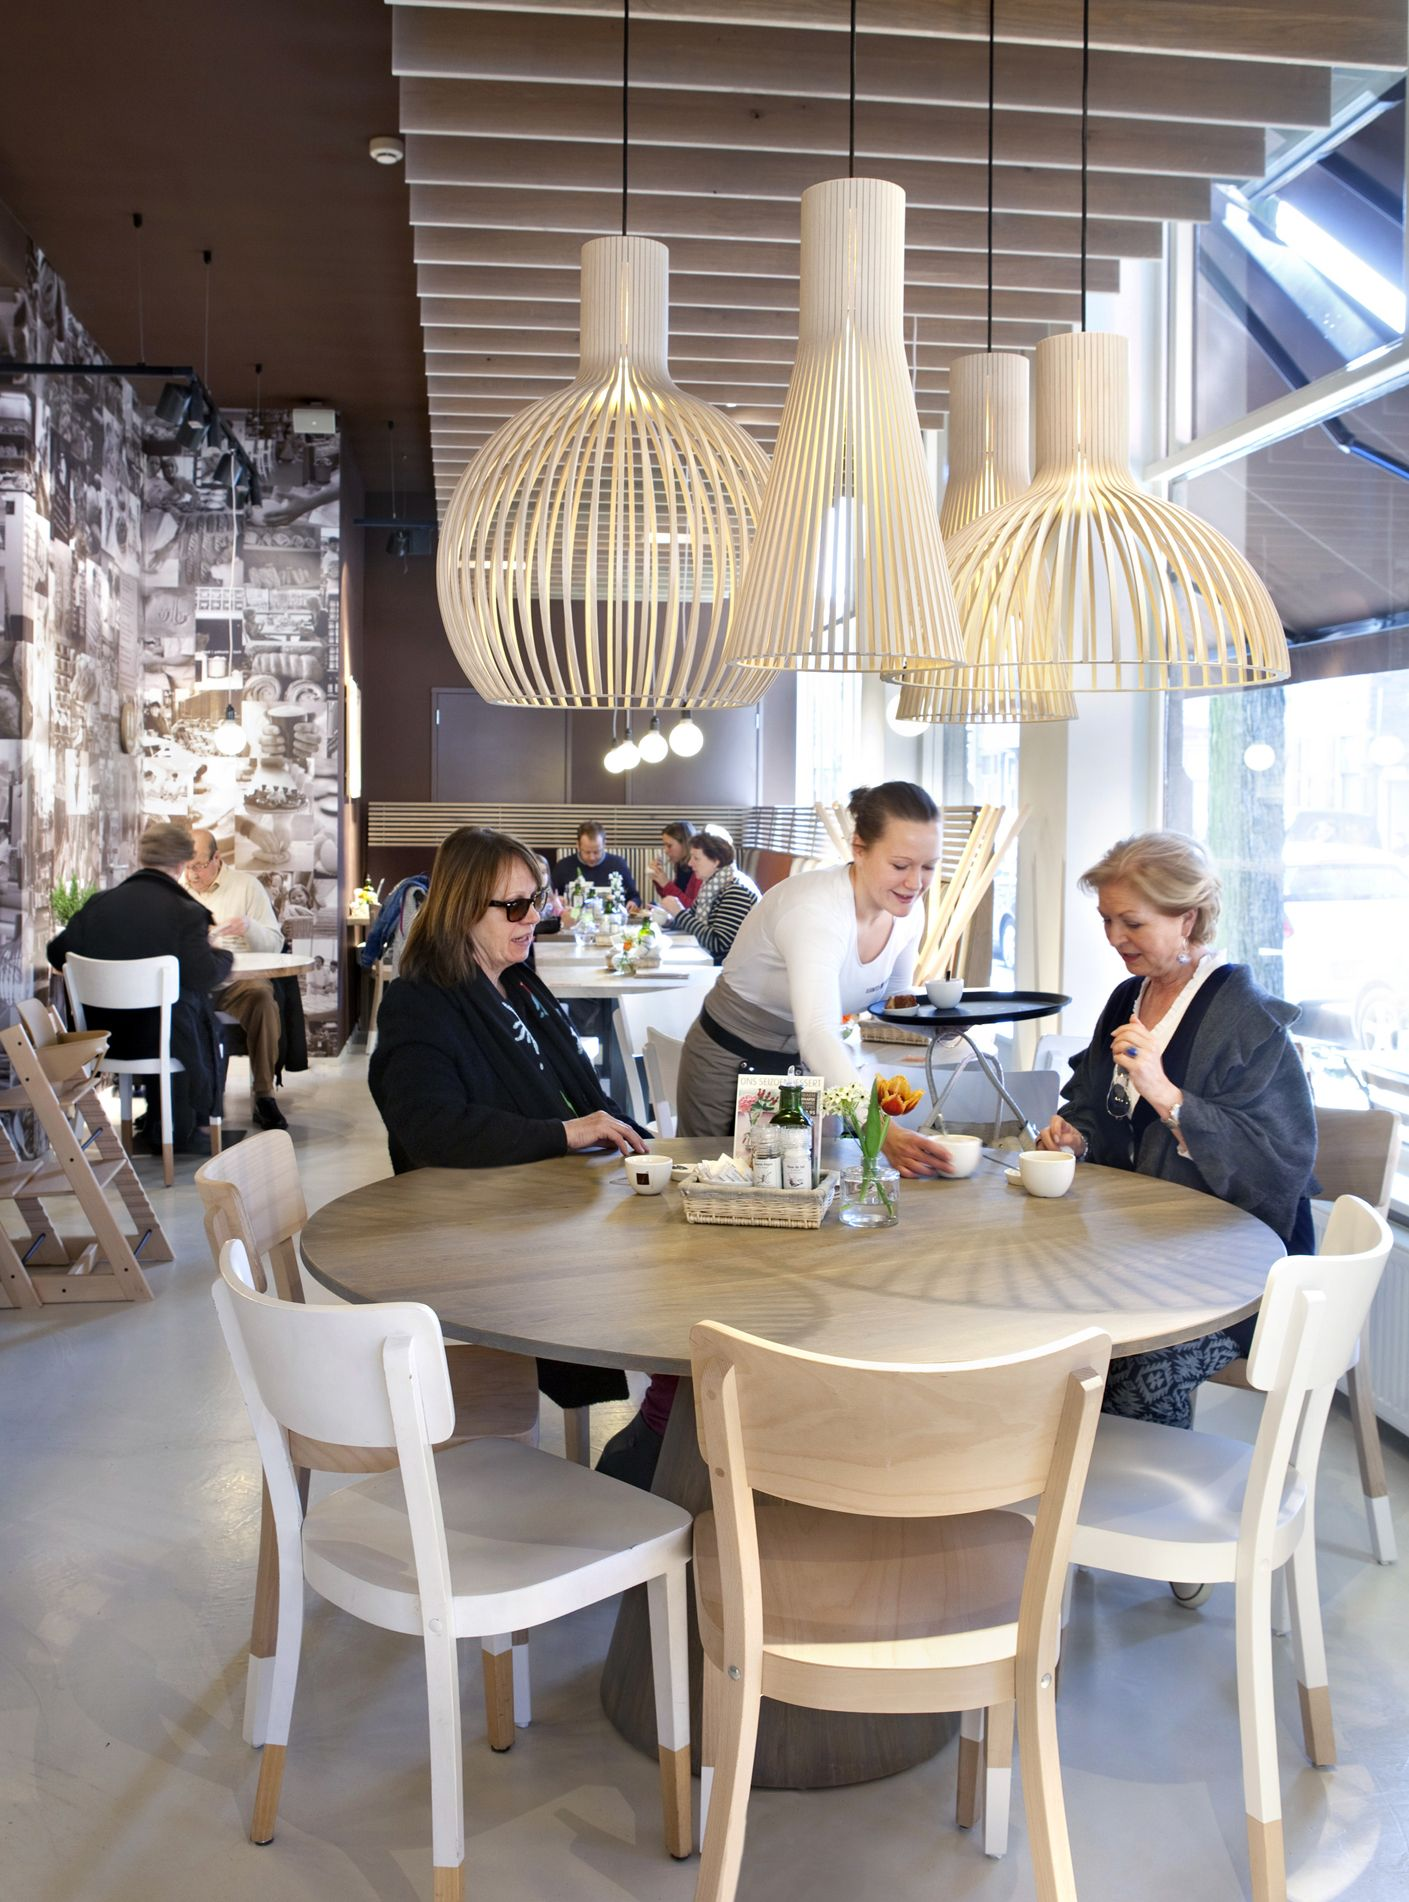 Frederik hendriklaan den haag onze baker cafe 39 s for Den haag restaurant